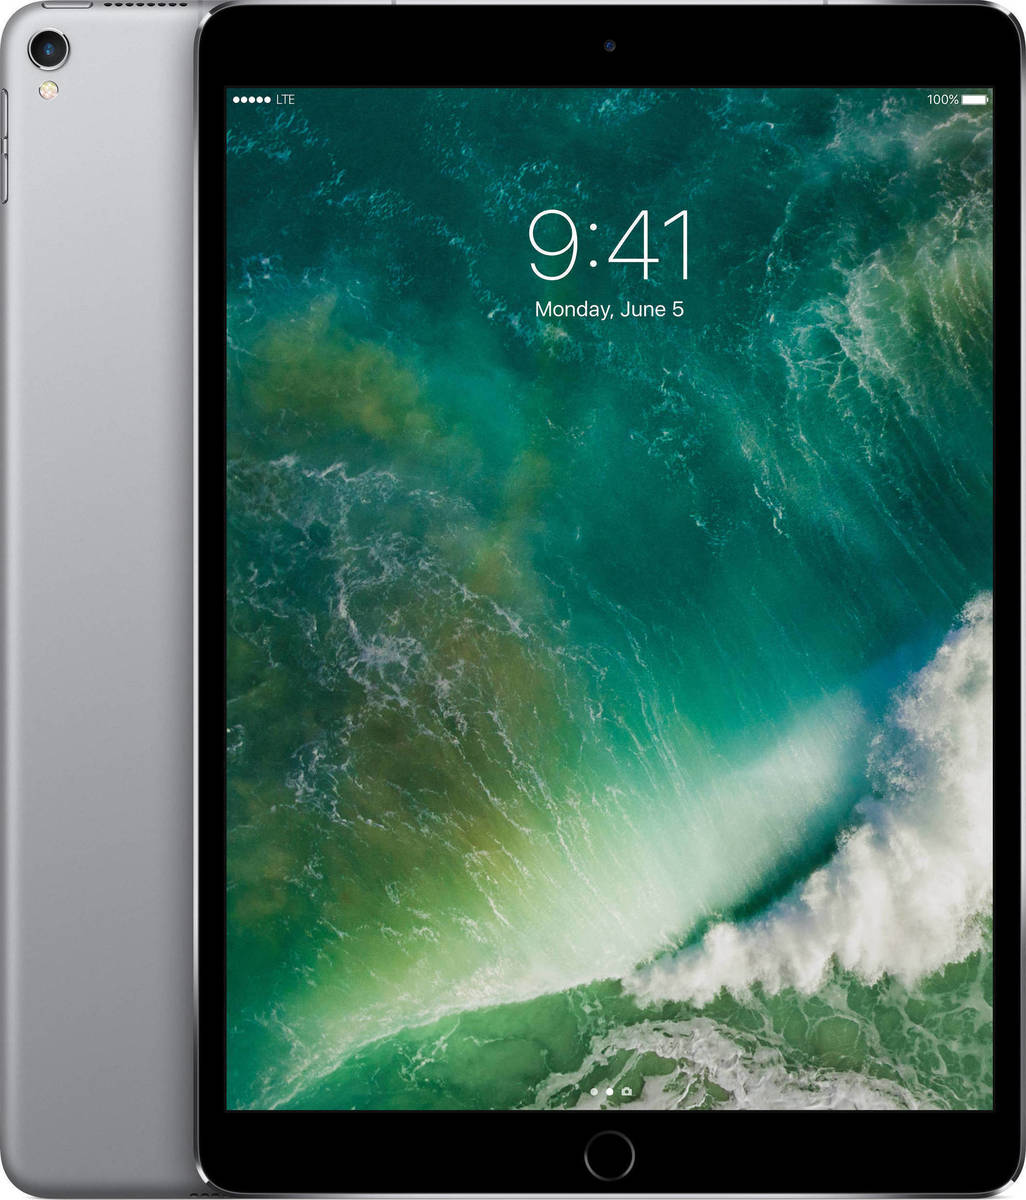 Apple iPad Pro 10.5'' 2017 WiFi and Cellular 64GB Space Grey Με Αντάπτορα Πληρωμή έως 12 δόσεις